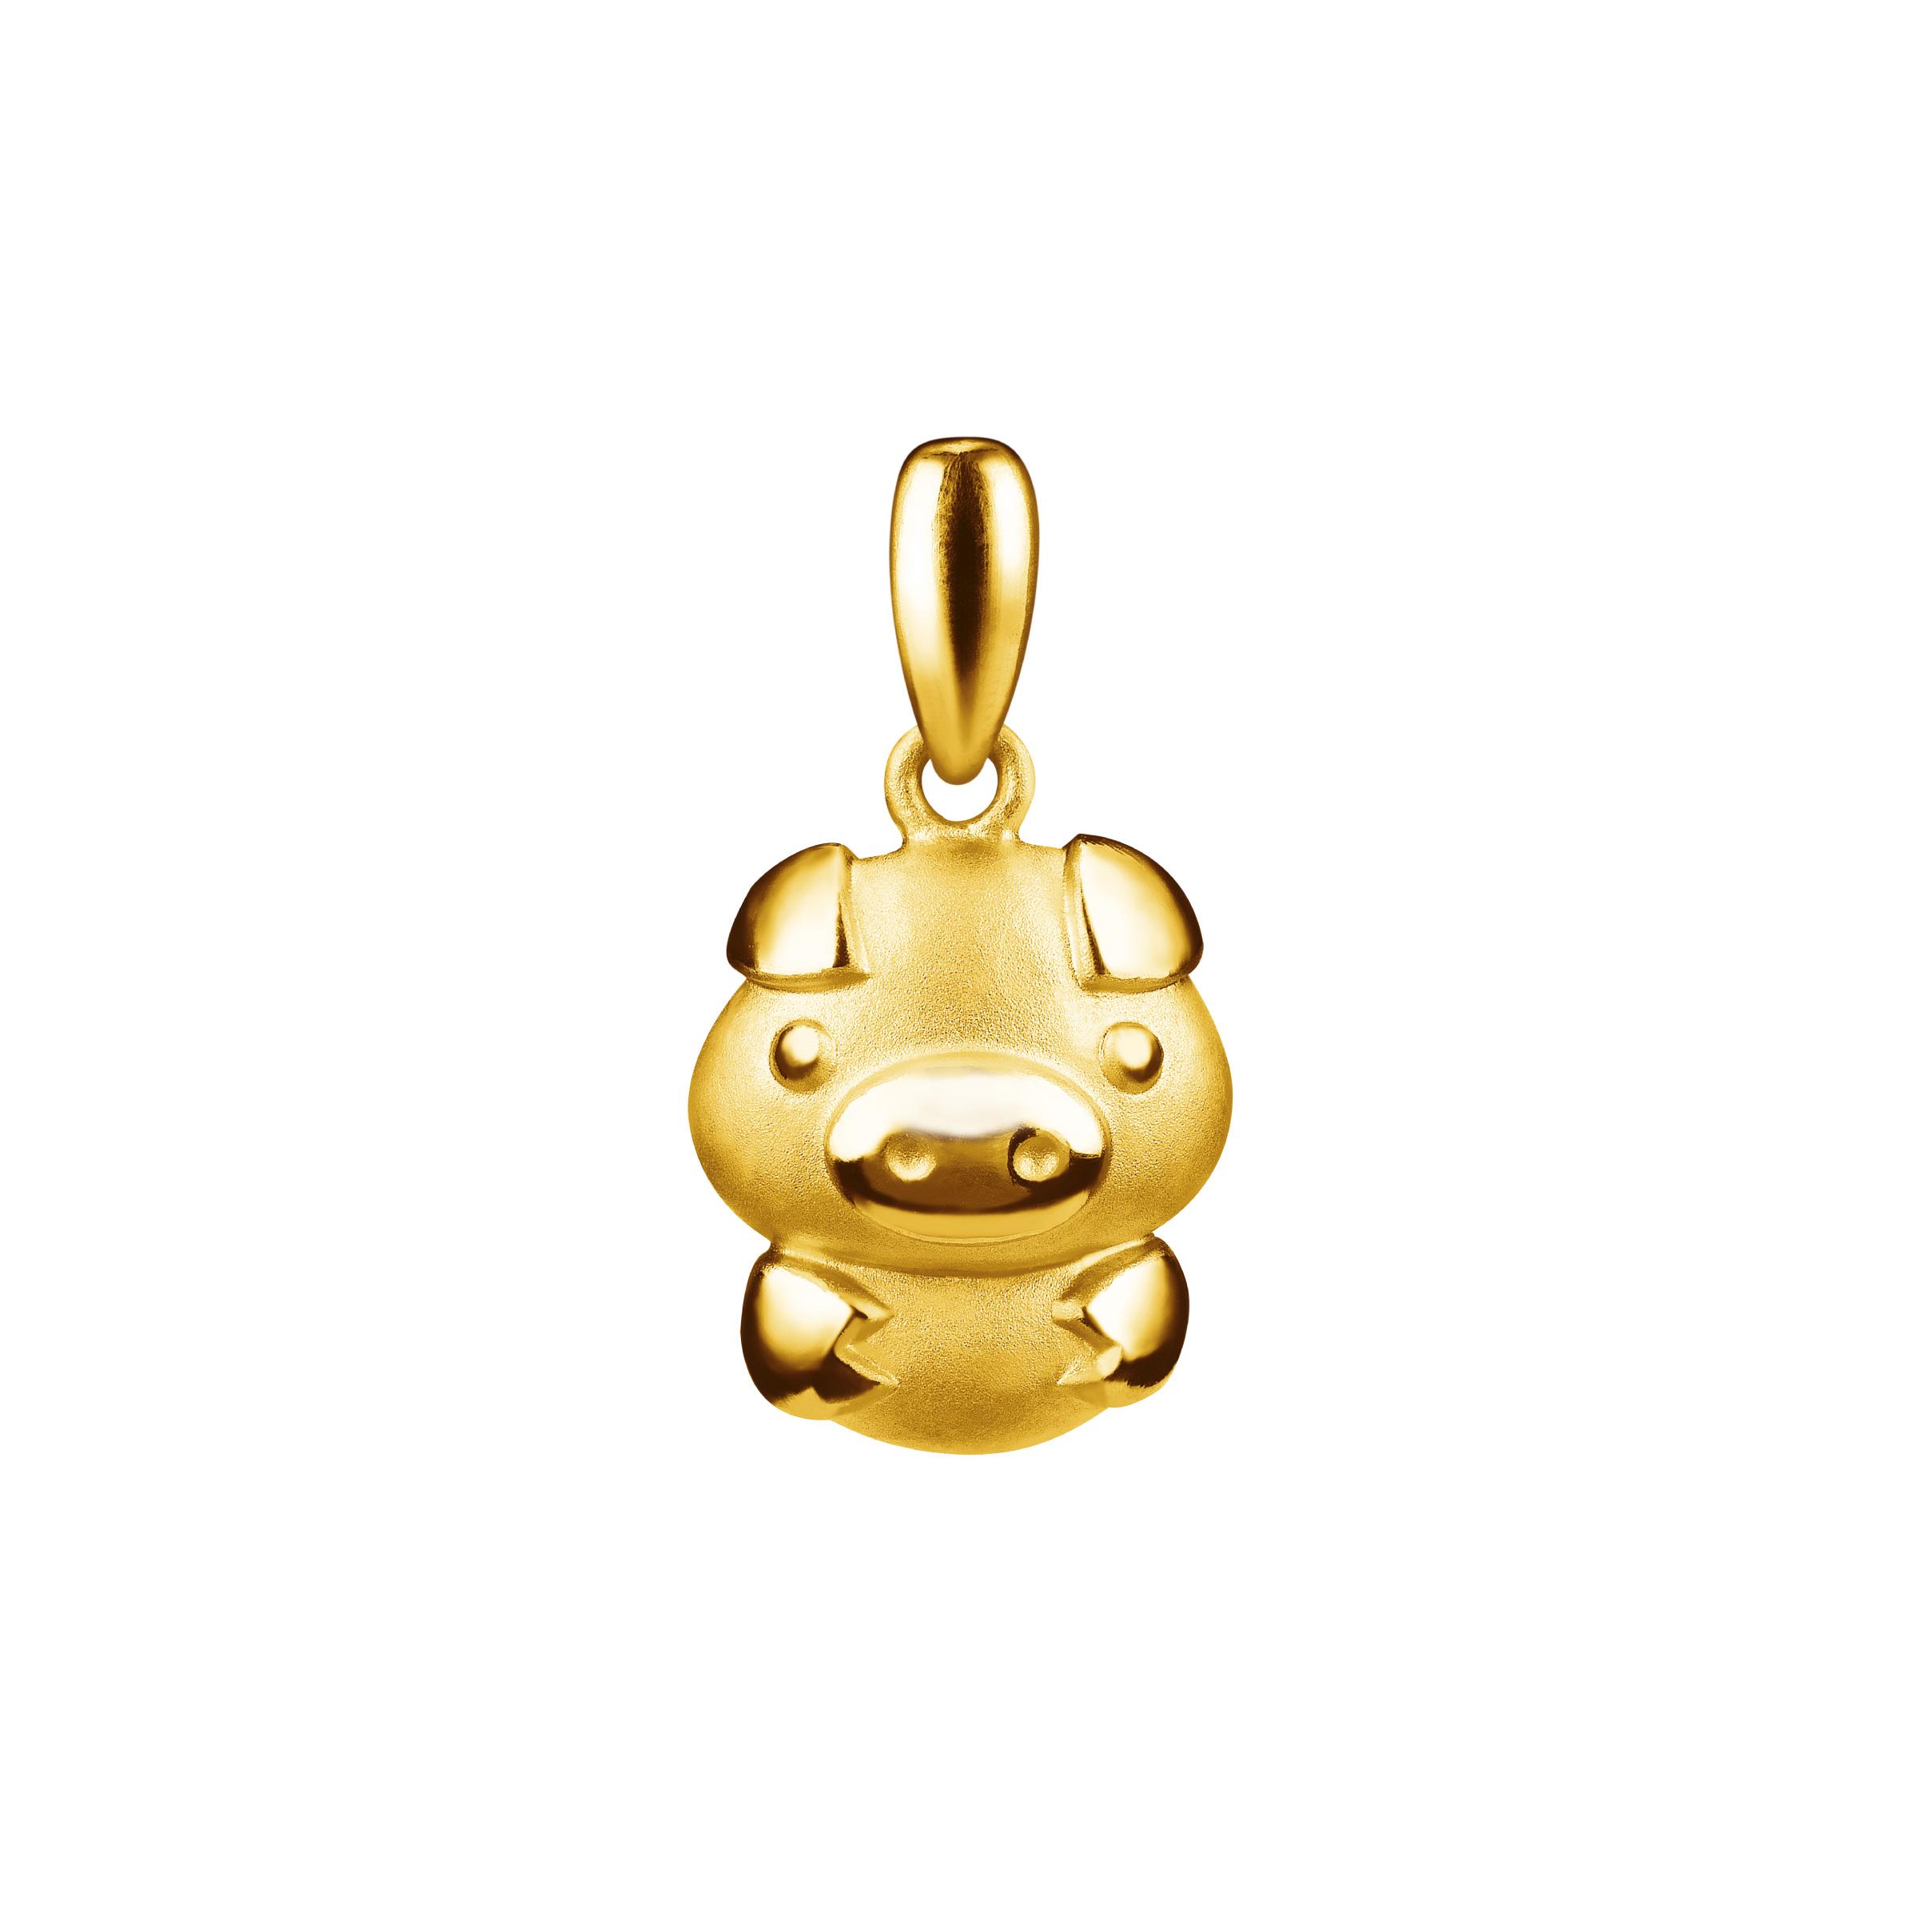 12 Chinese Zodiac Gold Pendant-Pig